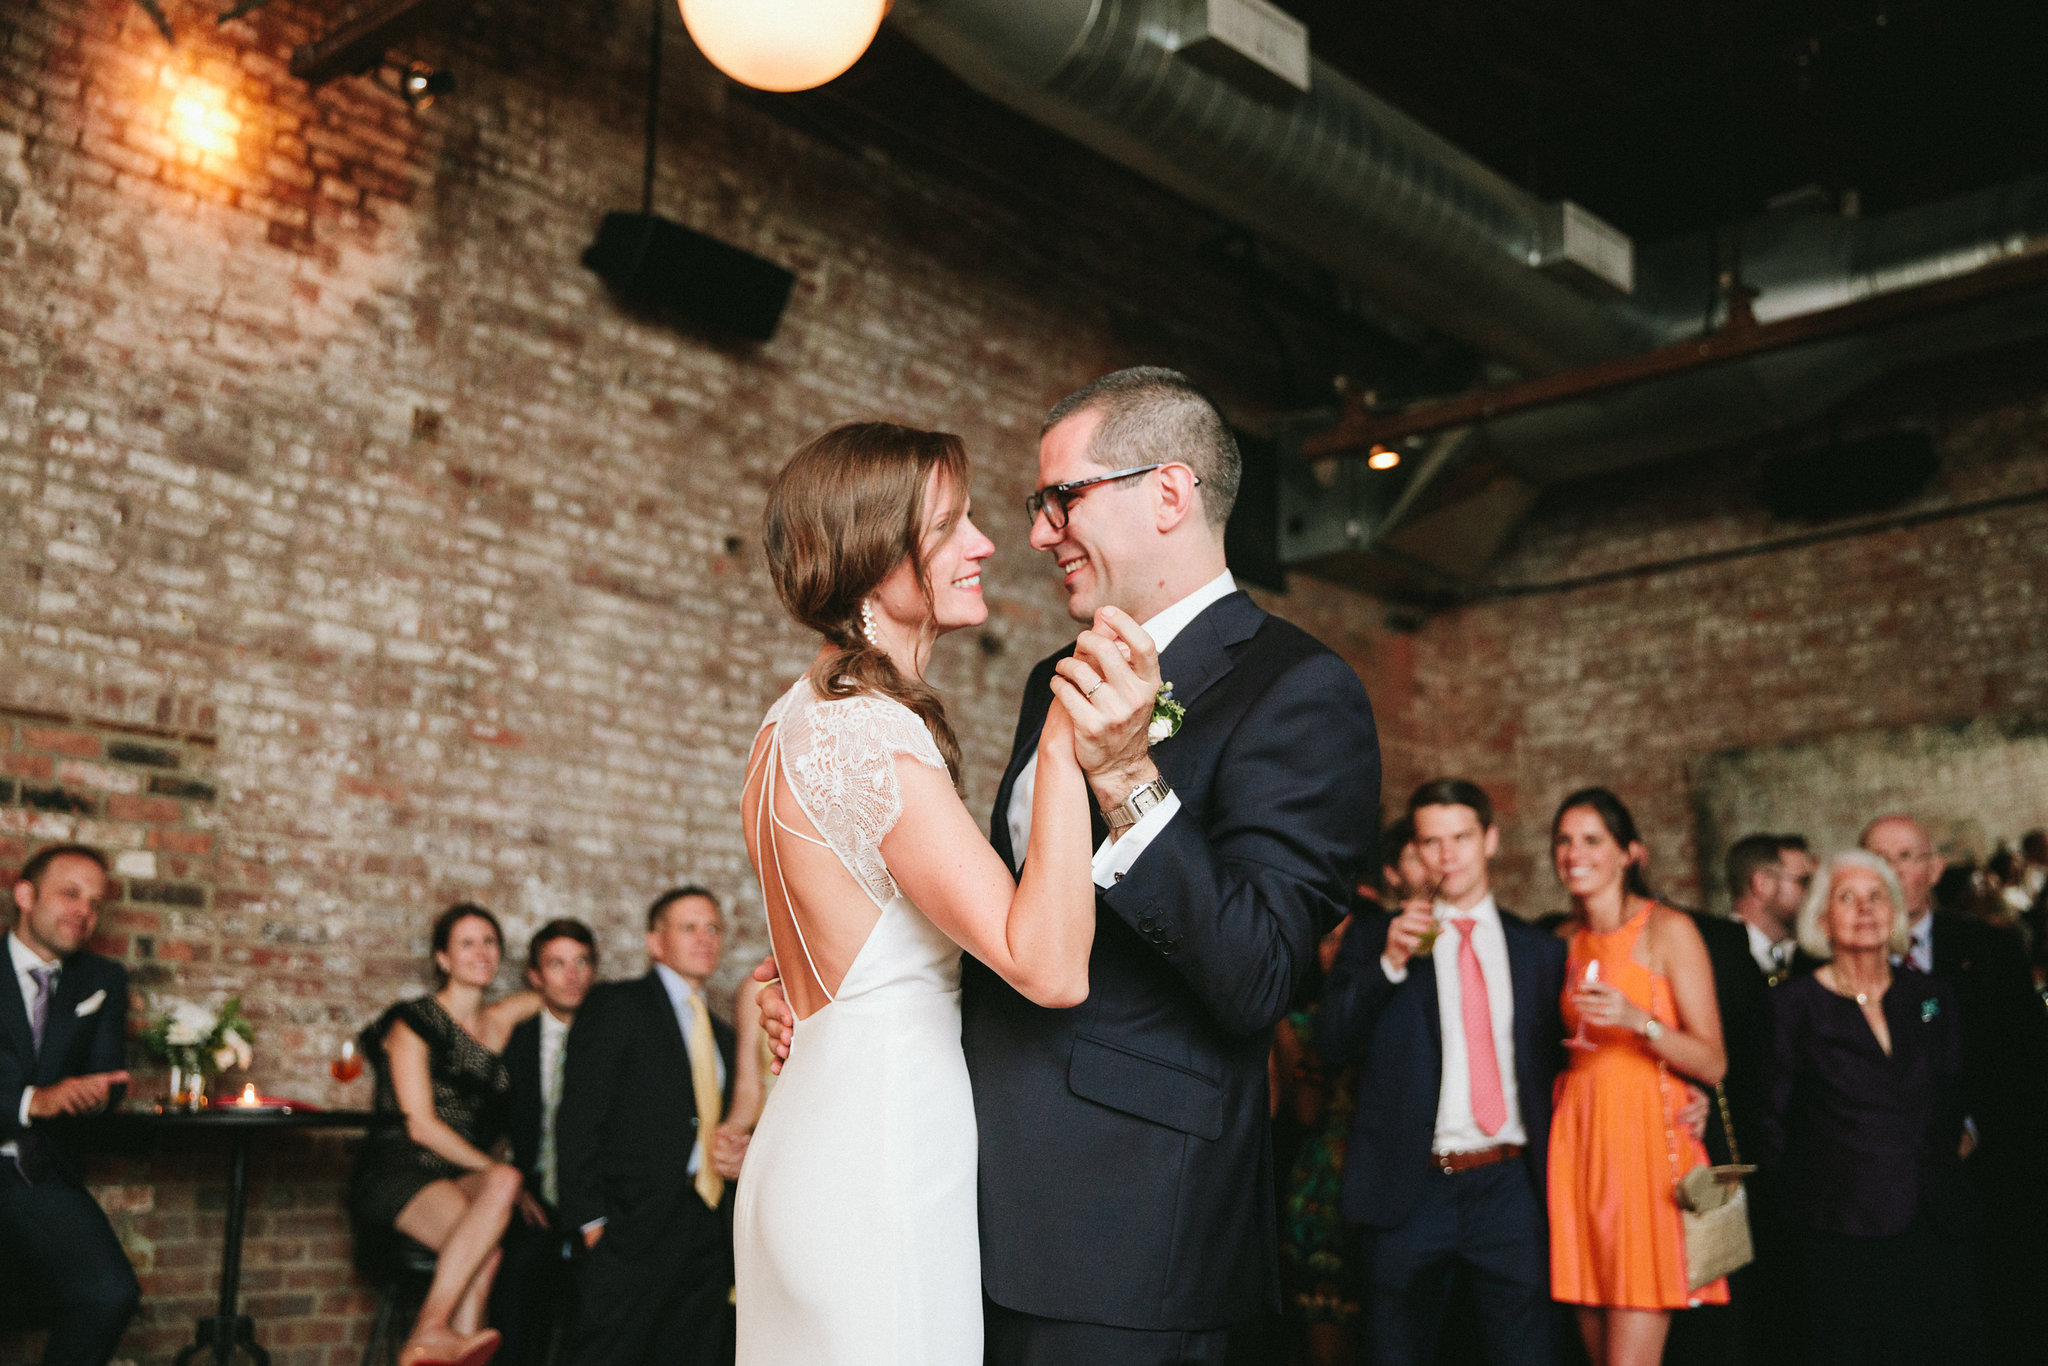 S+M-wythe-wedding-jove-meyer-events-0150.jpg